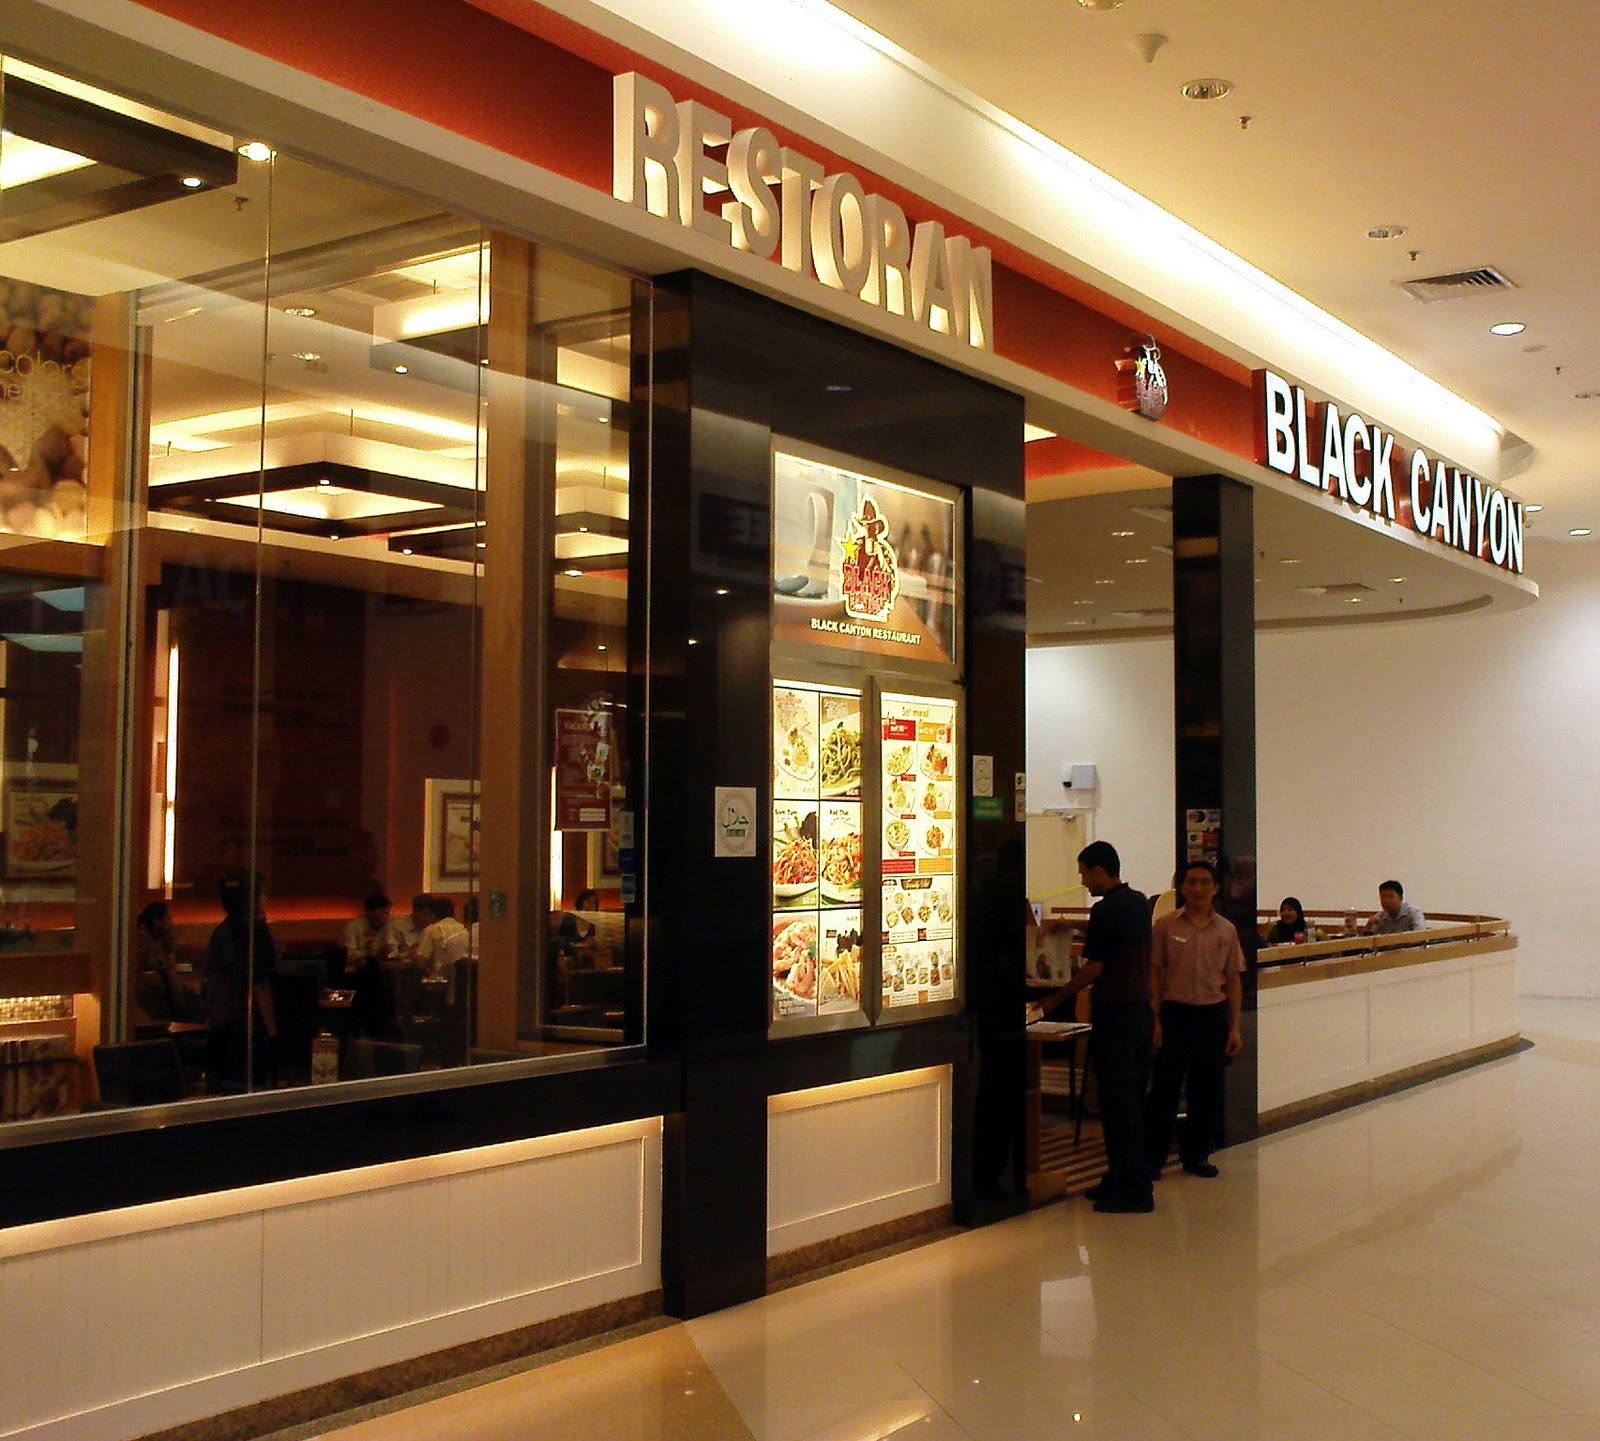 Black Canyon Restaurant Menu Malaysia